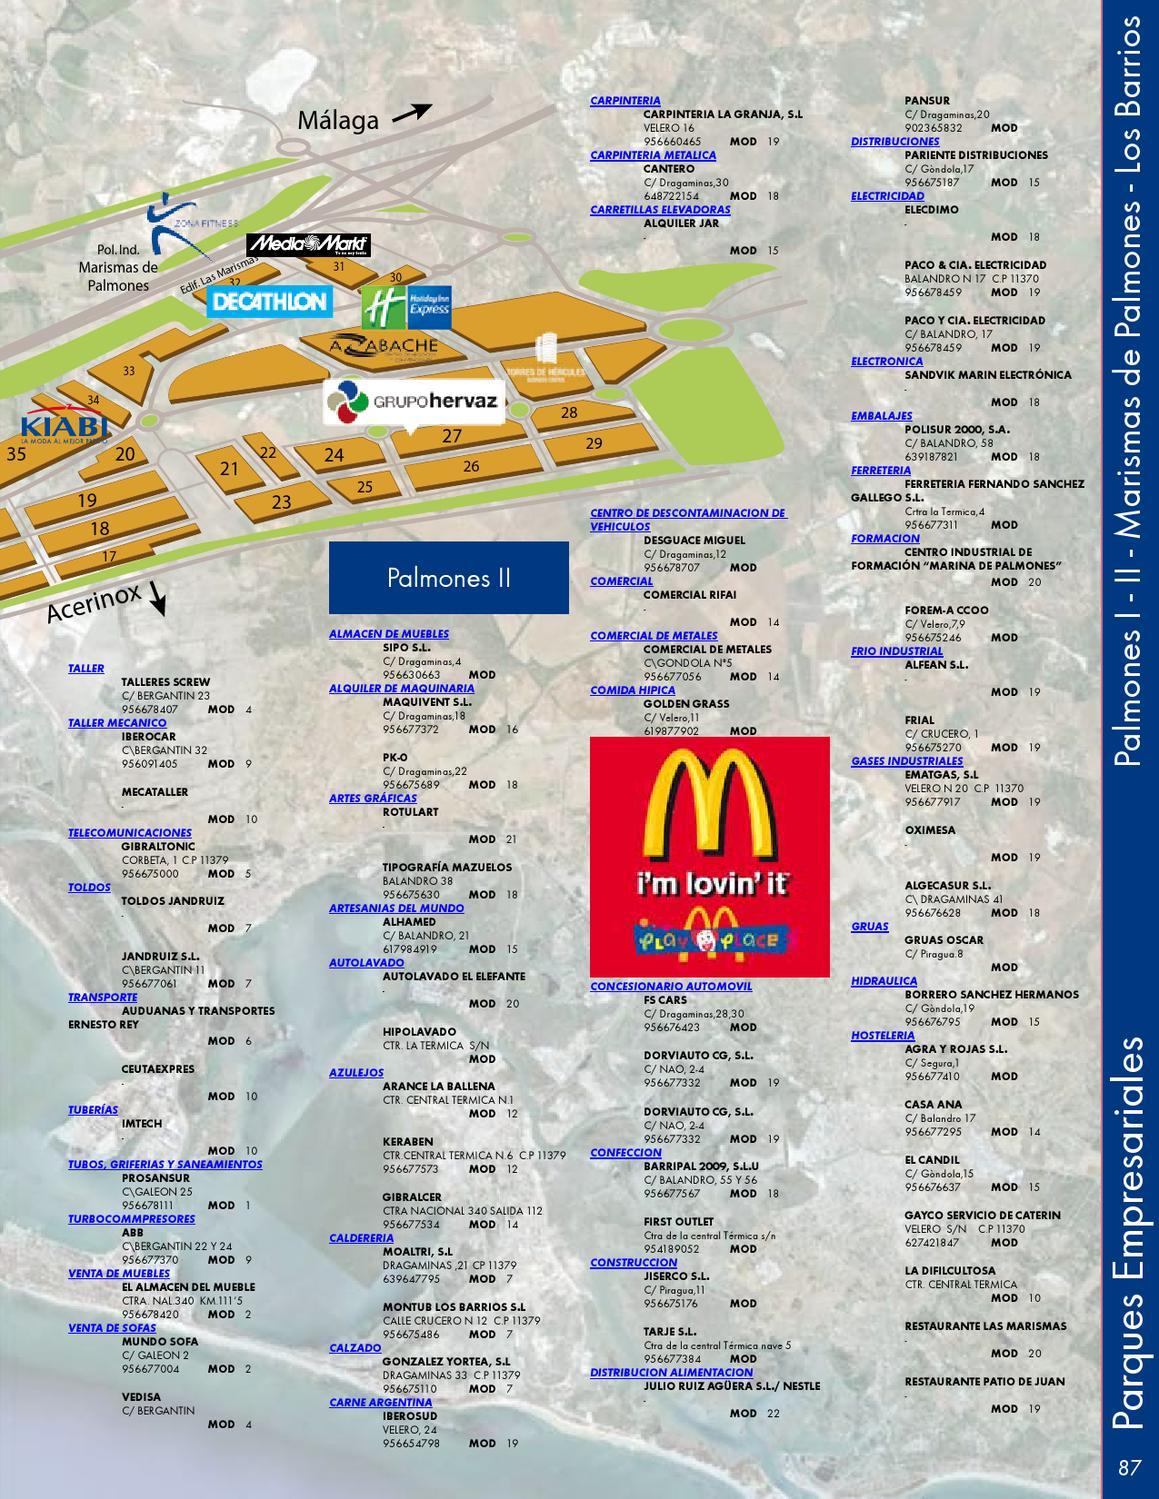 Parques Empresariales N M 37 By Grupo Eudiem Edifusi N  # Muebles Sipo Los Barrios